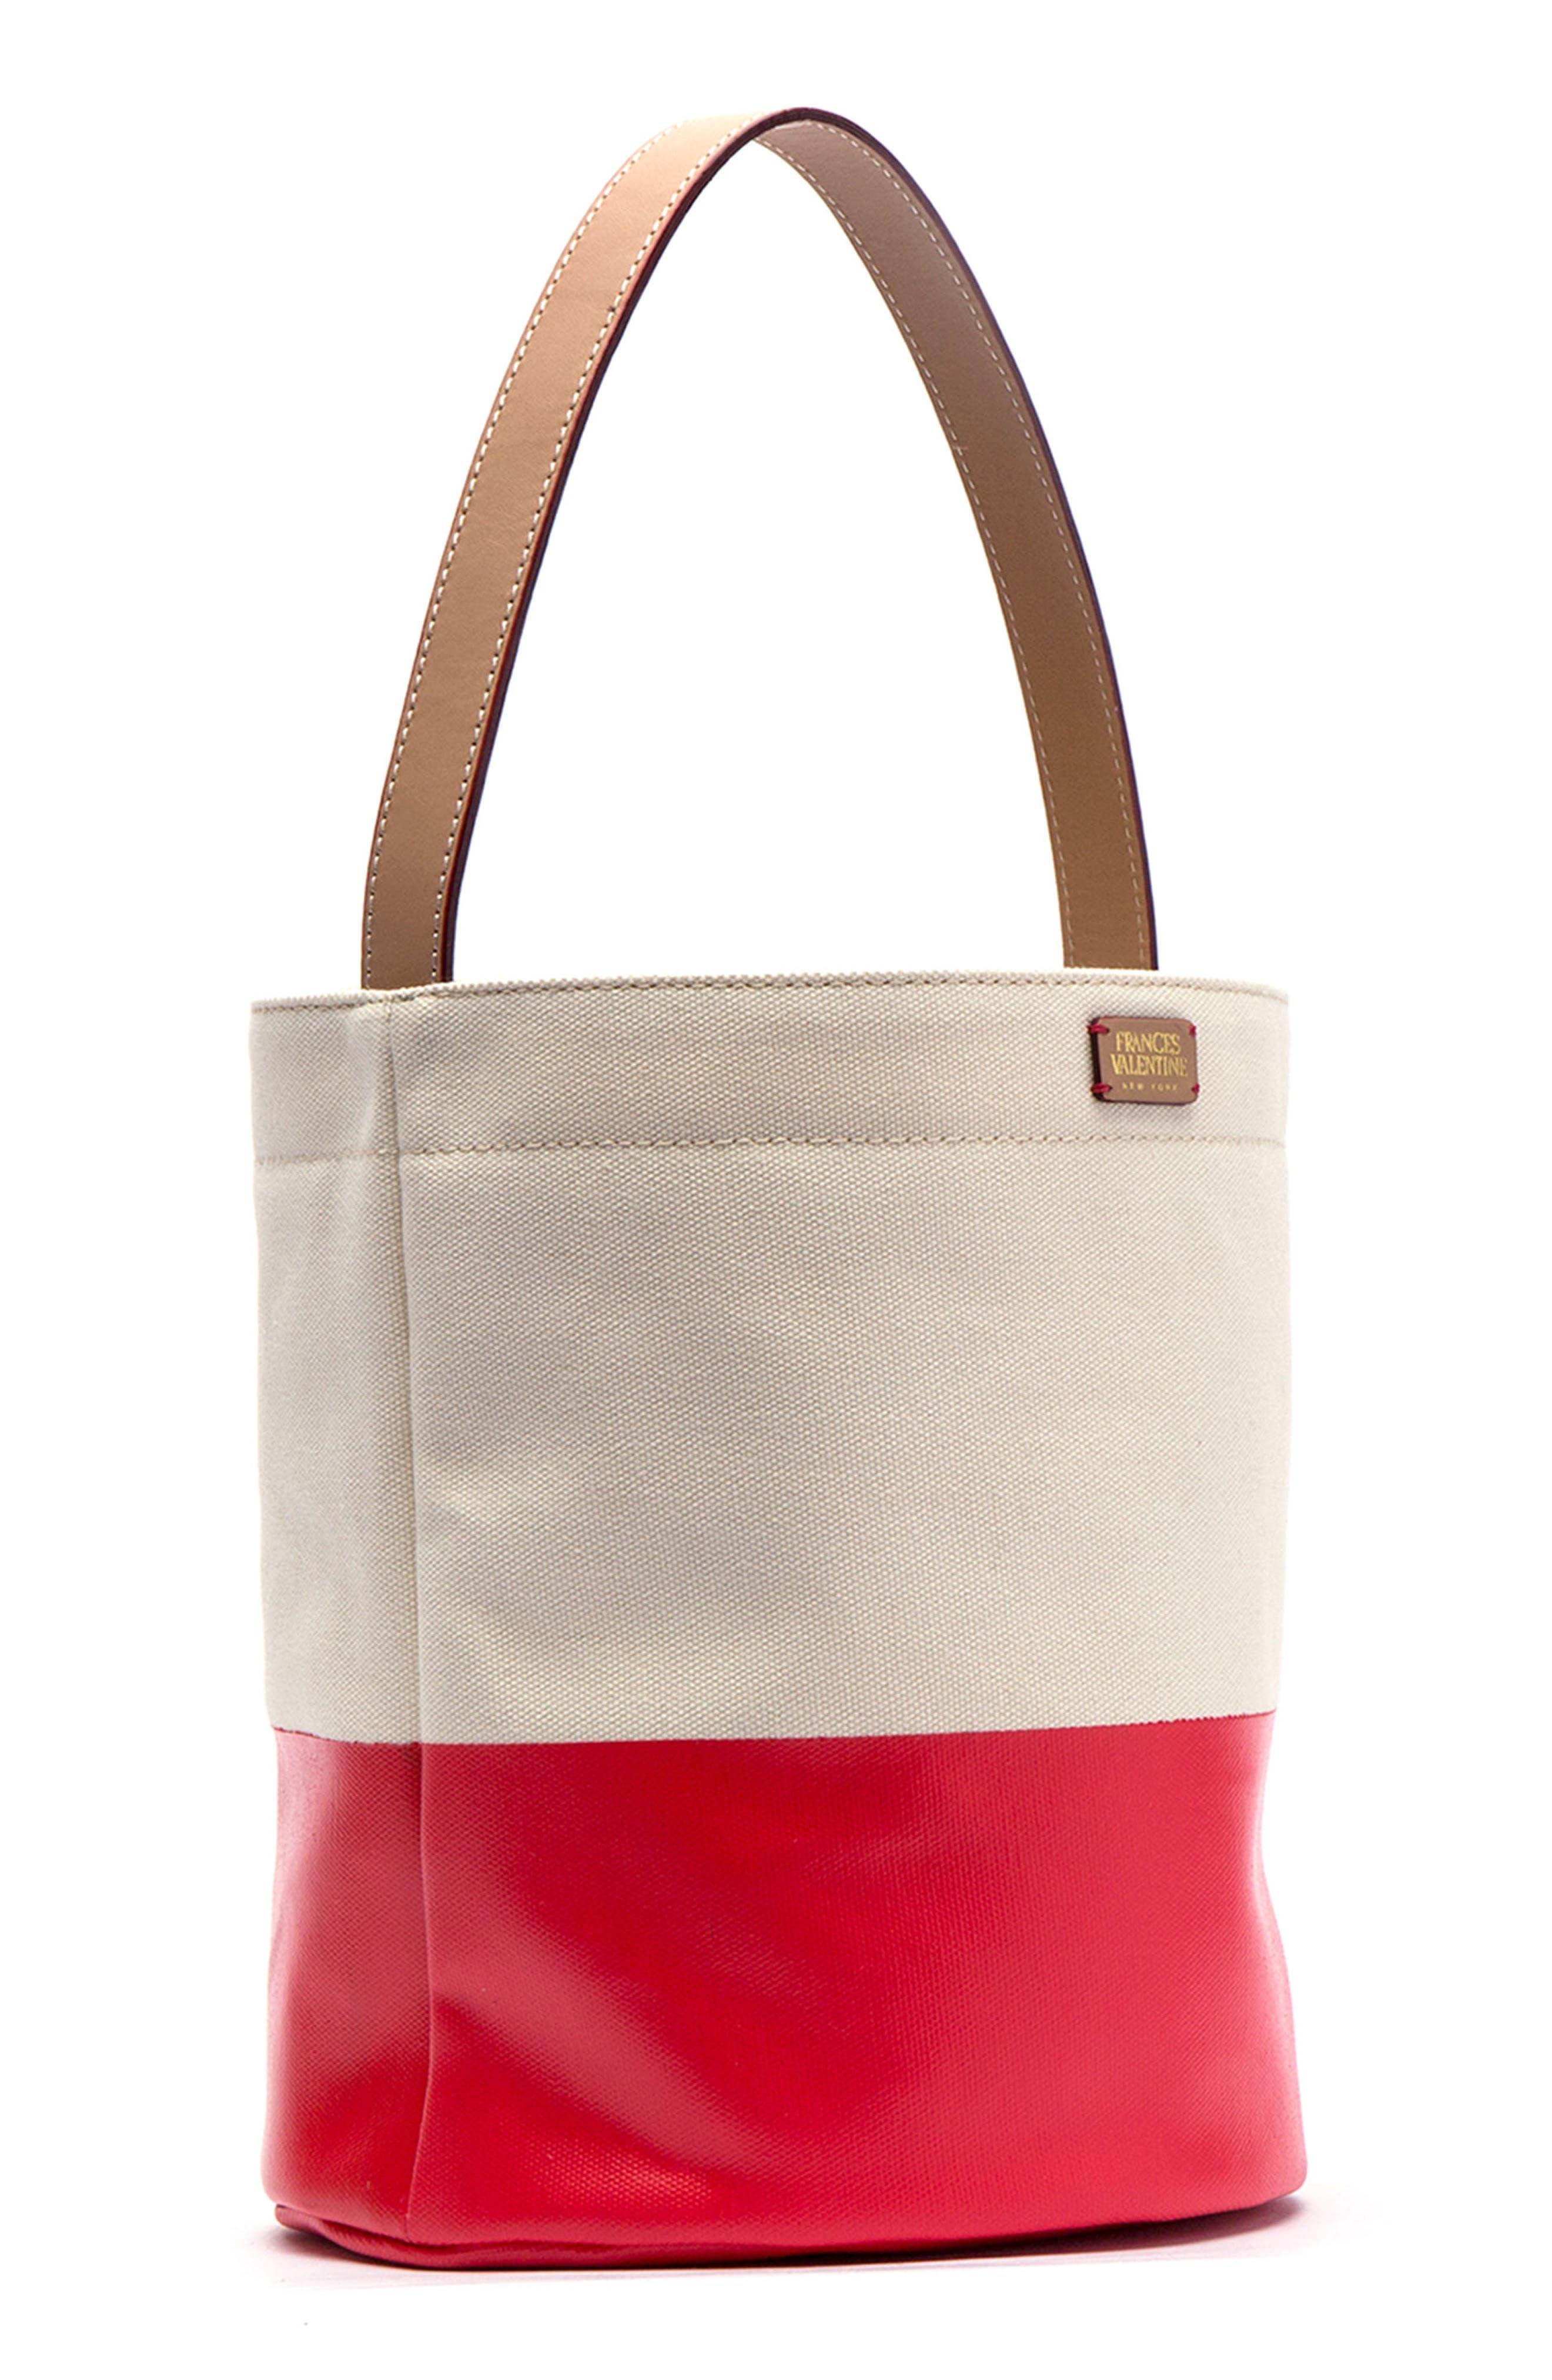 Frances Valentine Large Canvas Bucket Bag